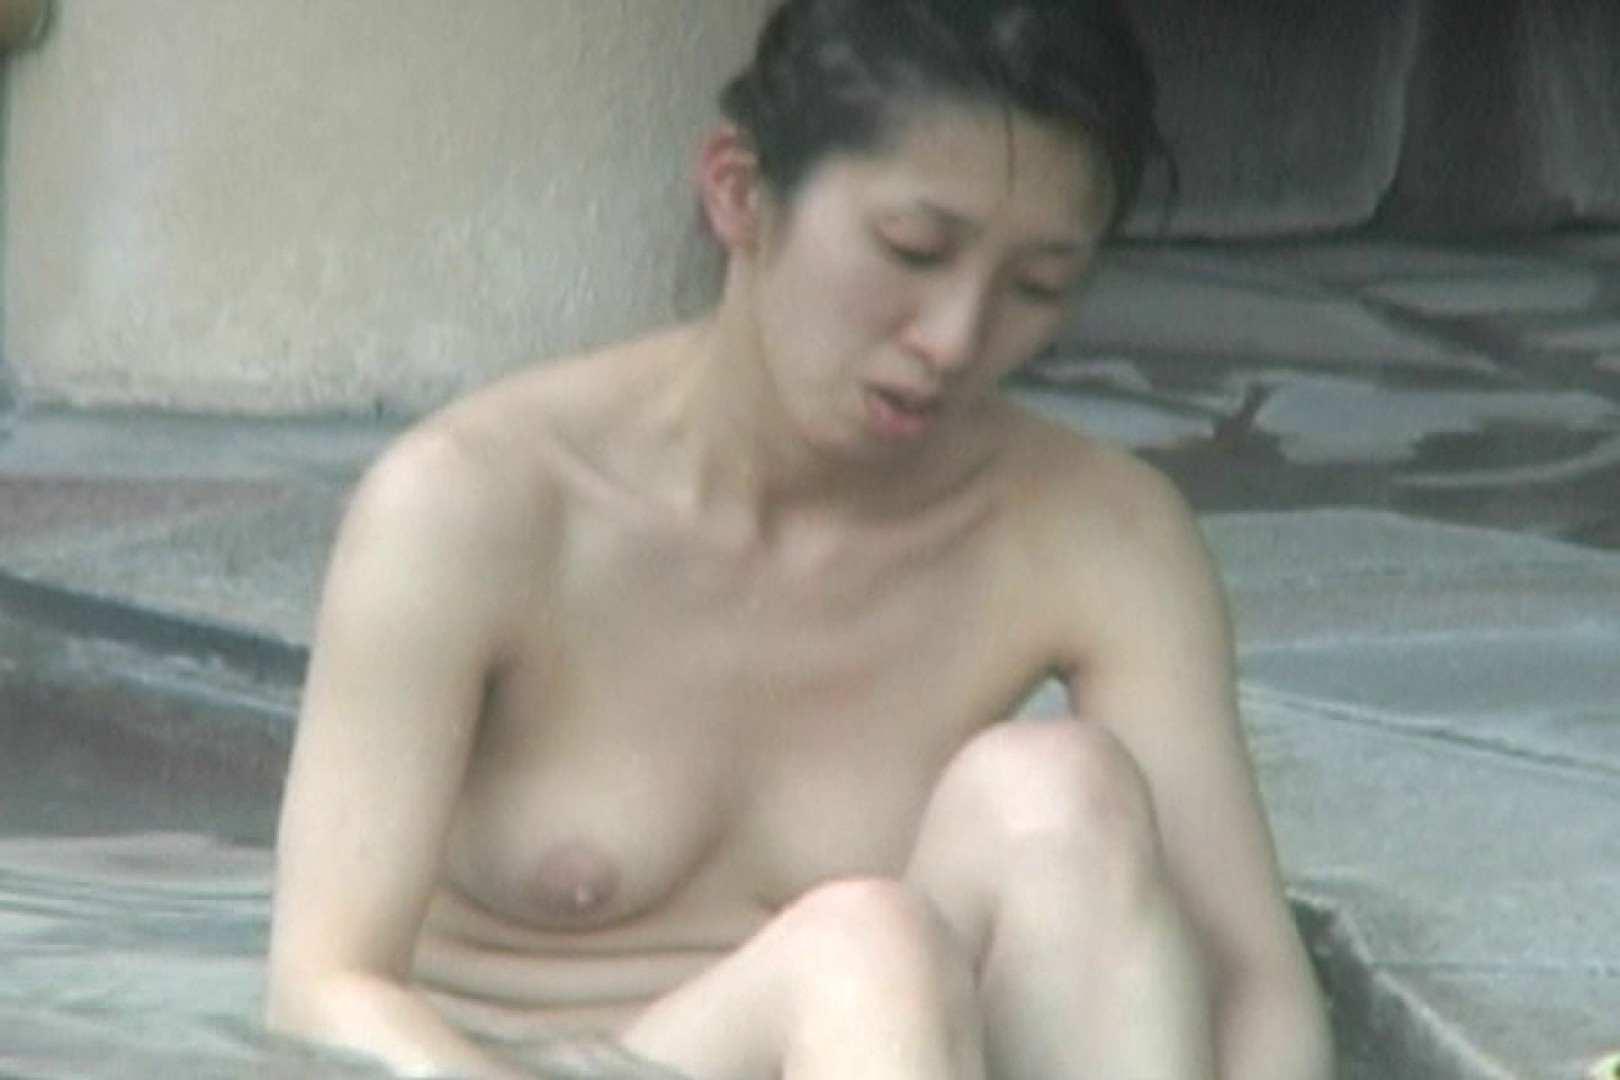 Aquaな露天風呂Vol.588 0   0  41連発 6